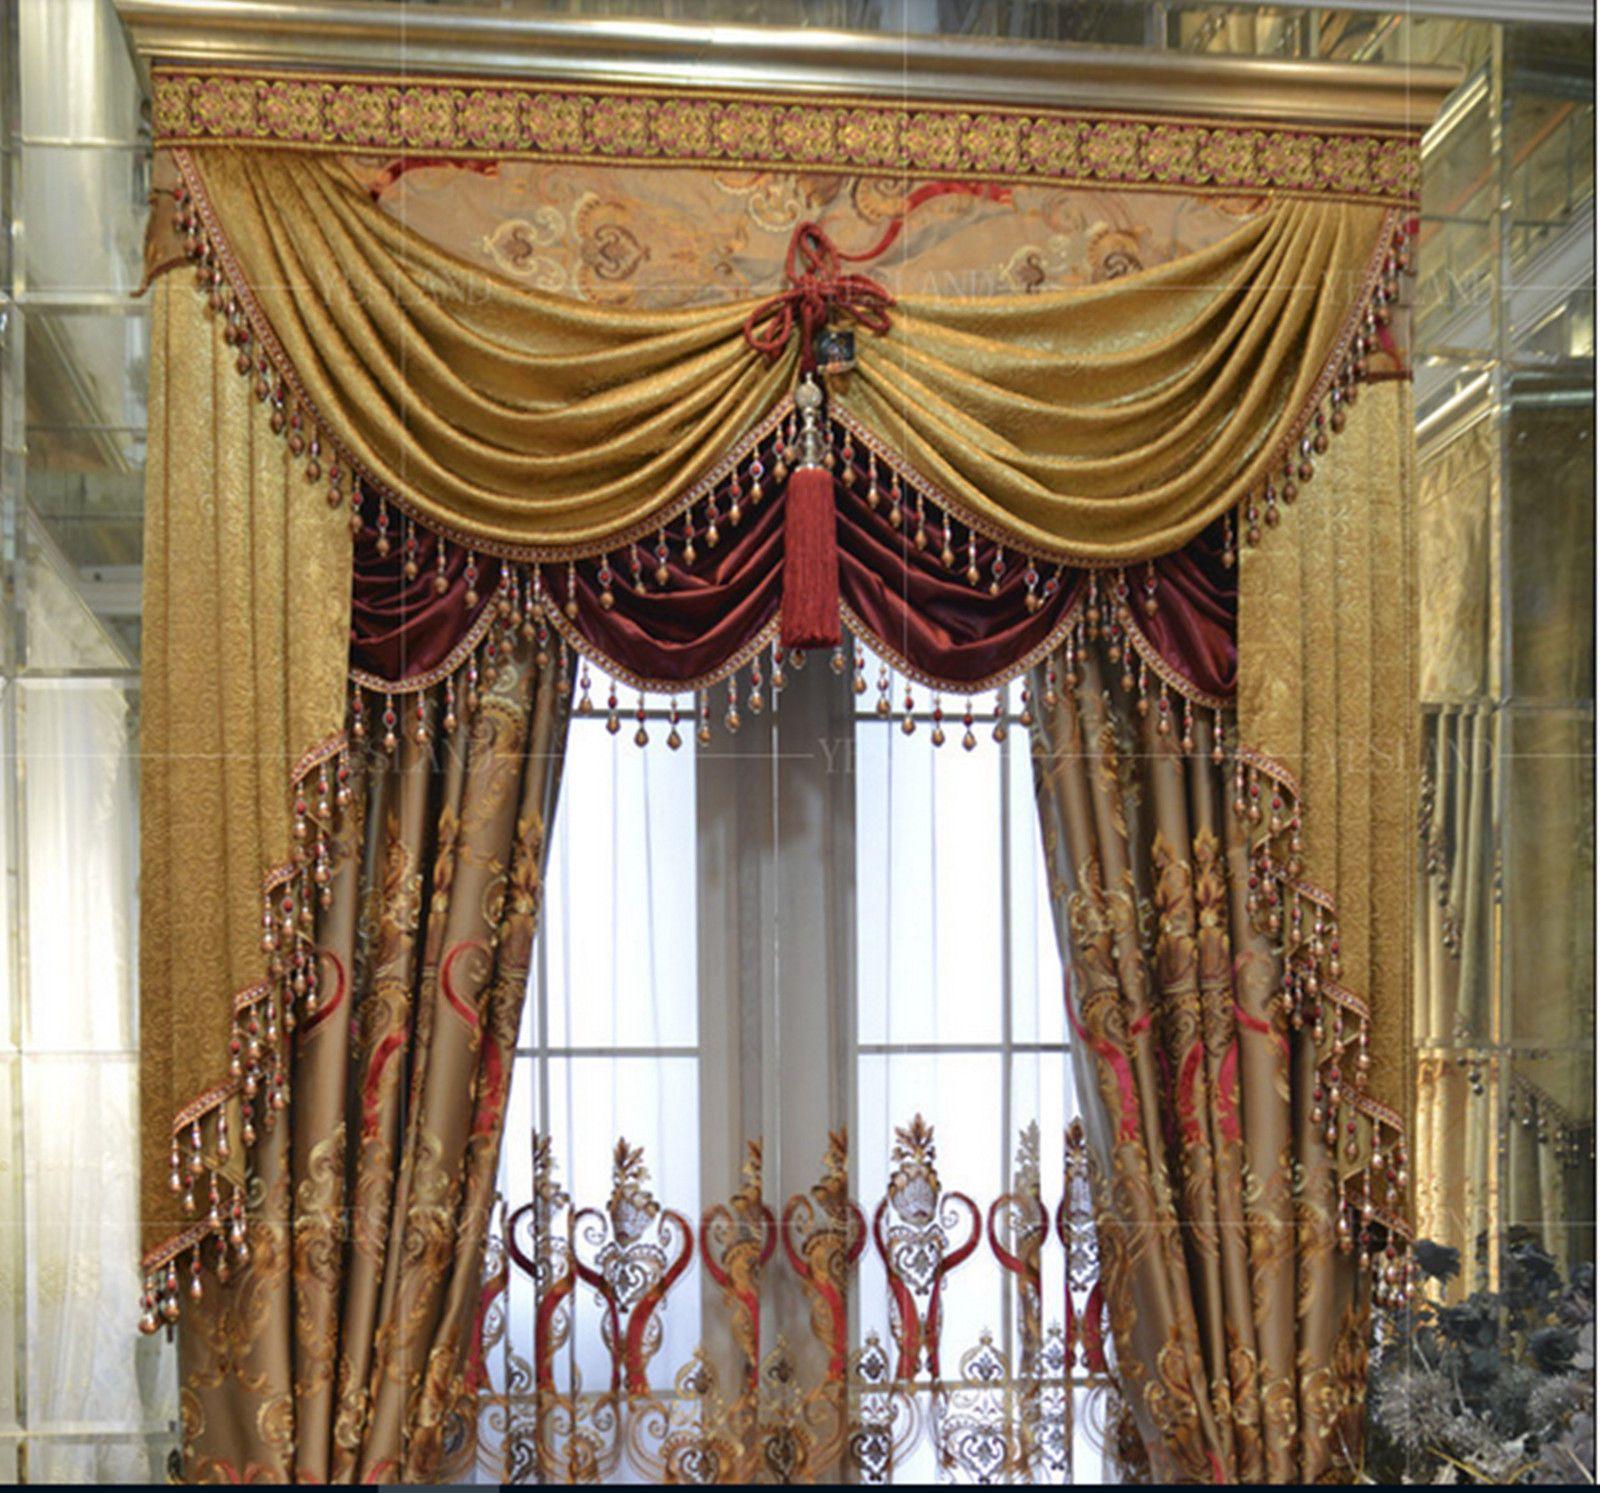 1m Curtain Sewing Fringe Trim Tassel New Beaded Fringe Trim